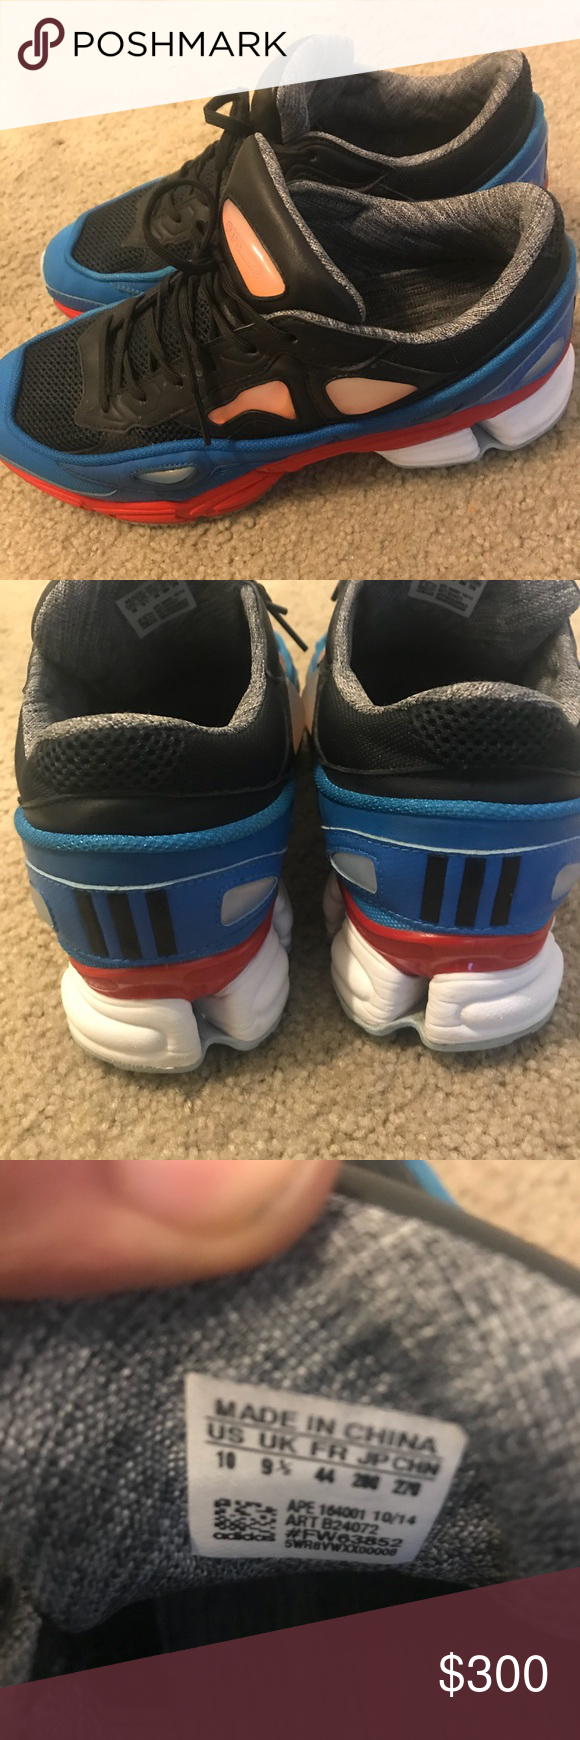 Raf simons shoes, Sneakers